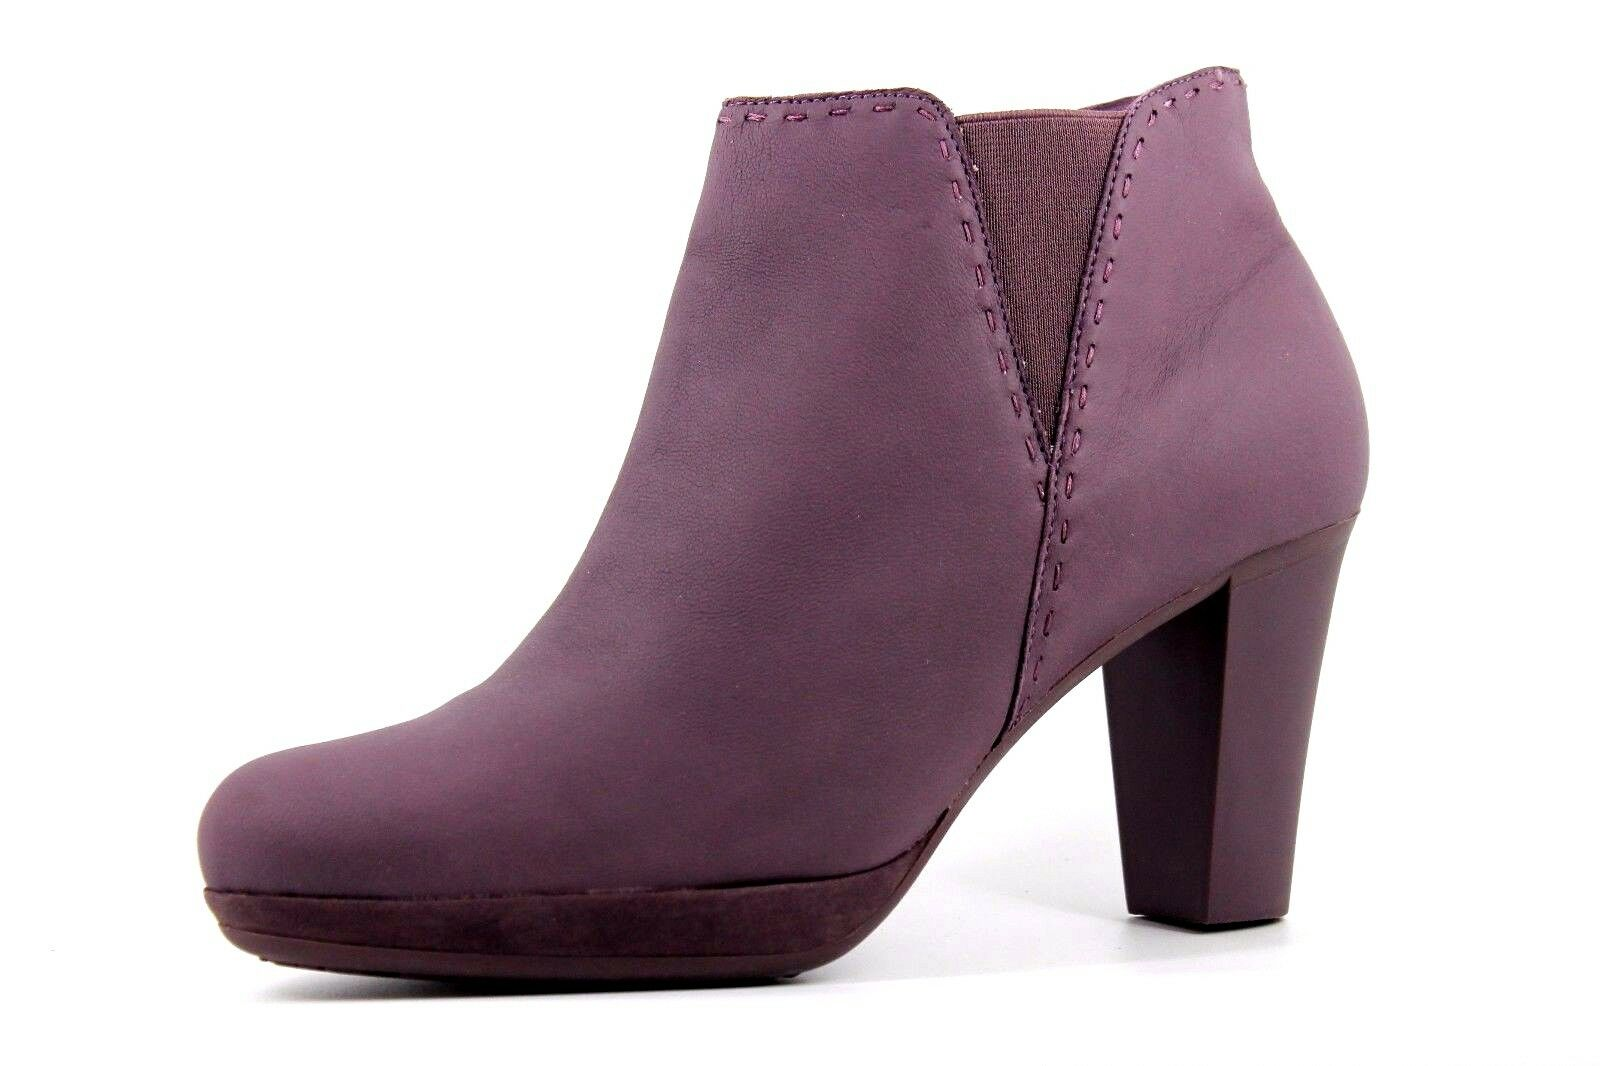 Camper Ariadna Alto Womens UK 7 EU 40 US 10 Mauve Leather Lara Flint Ankle Boots